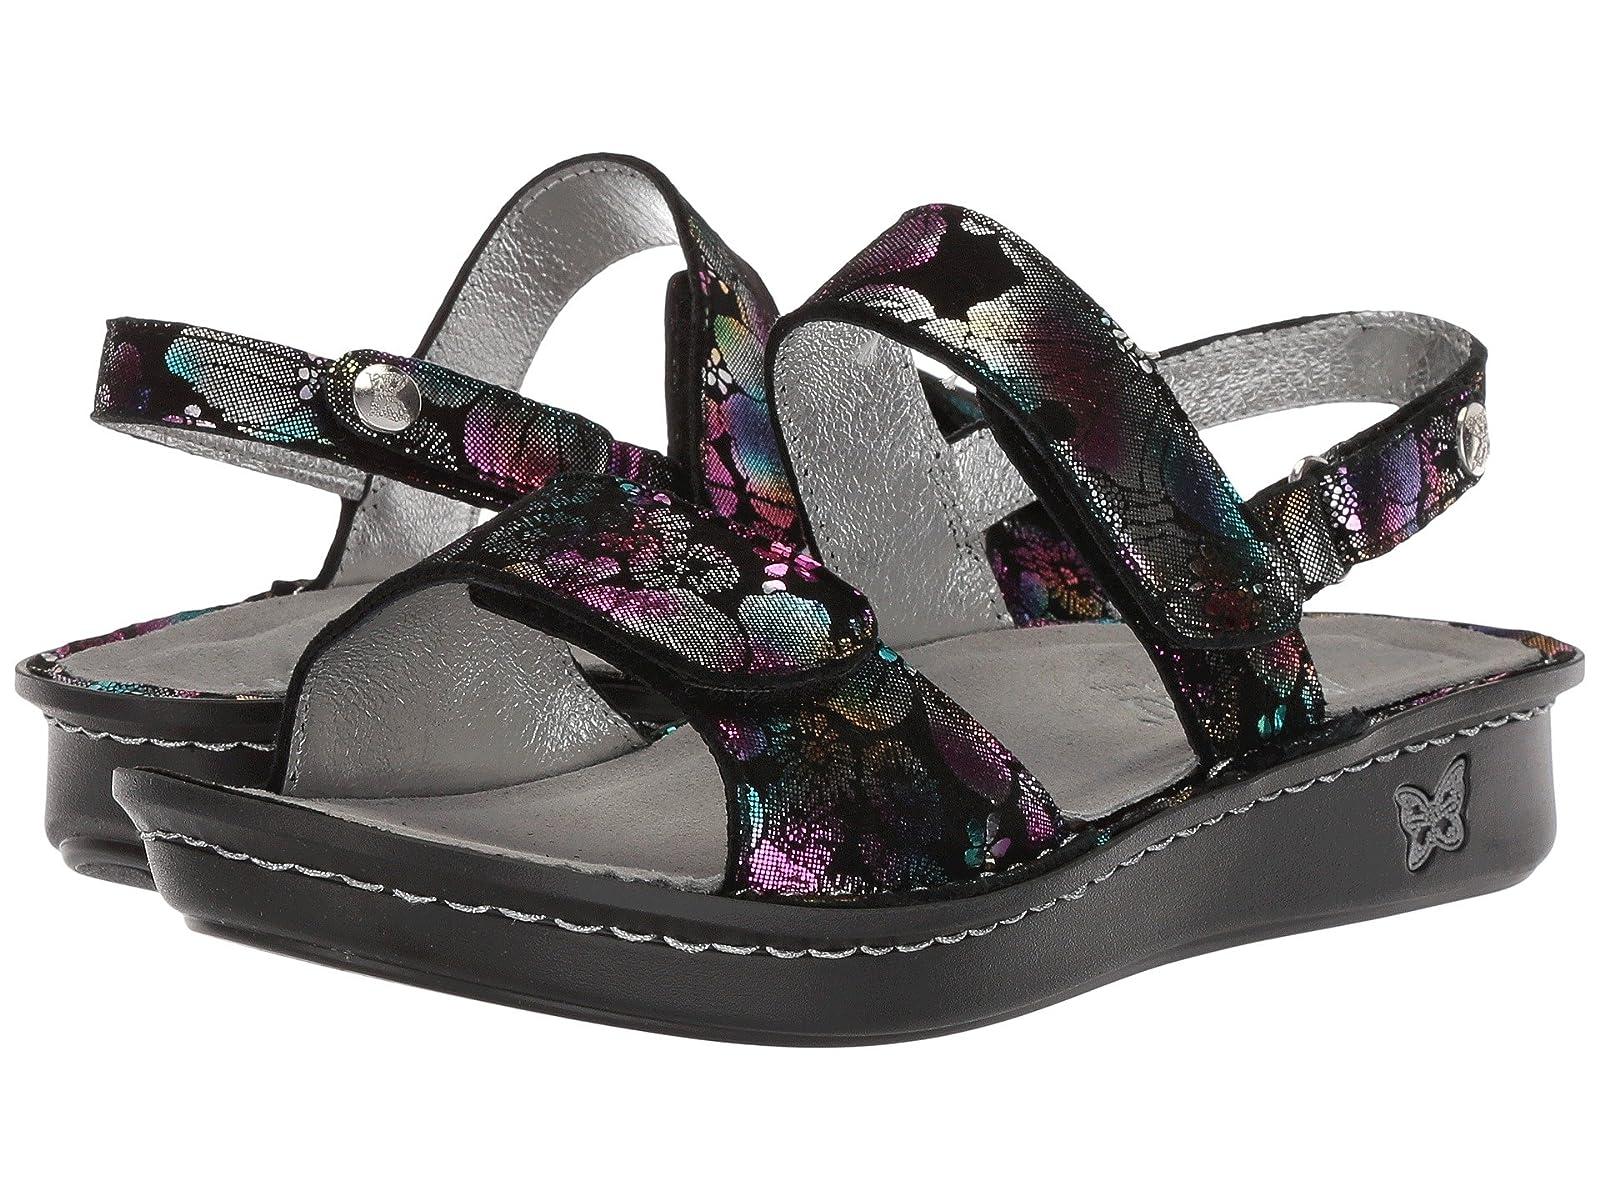 Alegria VeronaAtmospheric grades have affordable shoes